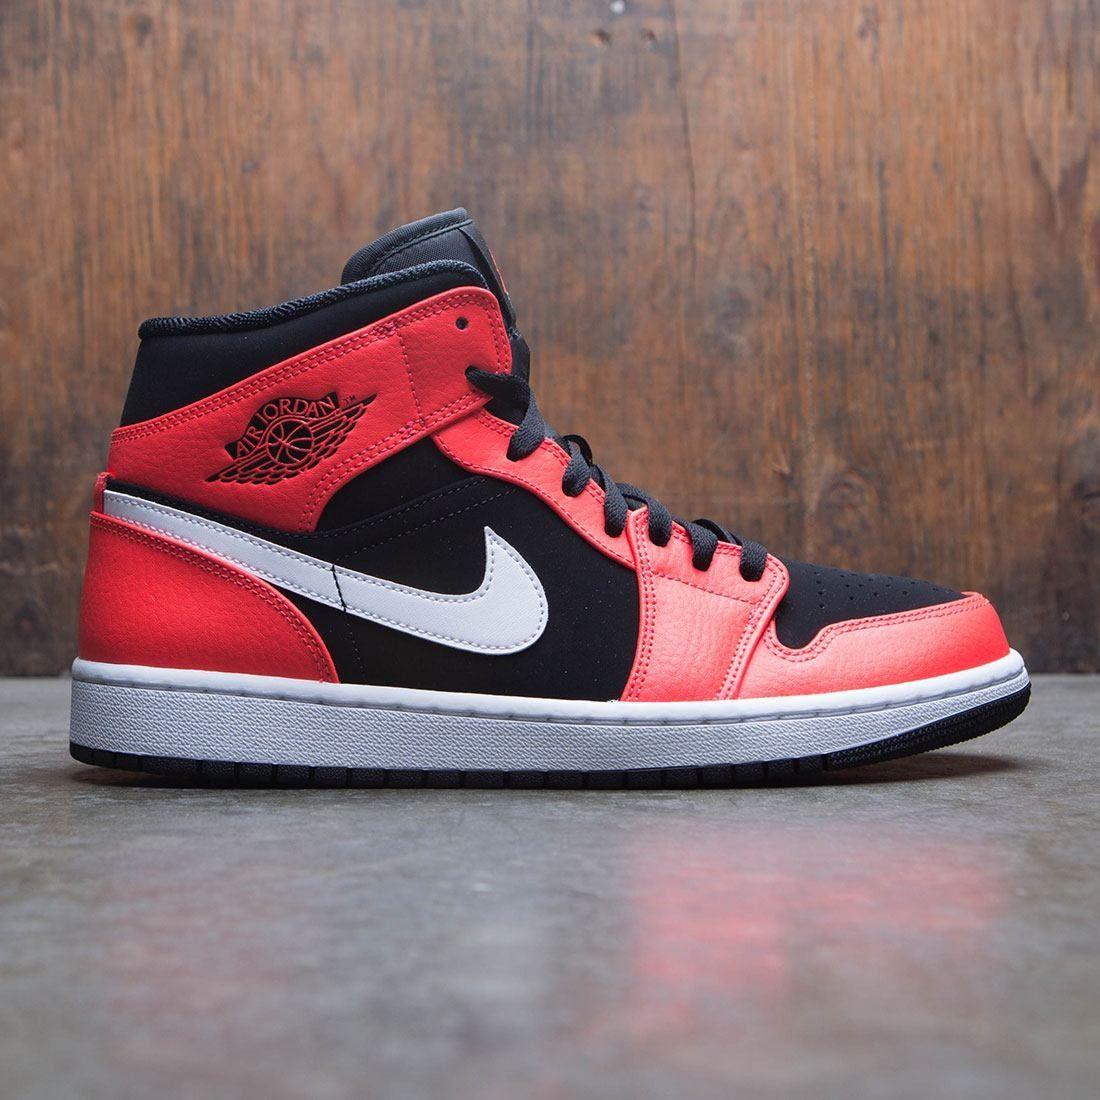 7acaed6eb92 Air Jordan 1 Mid Men (black / infrared 23-white) in 2019 | Shoes ...